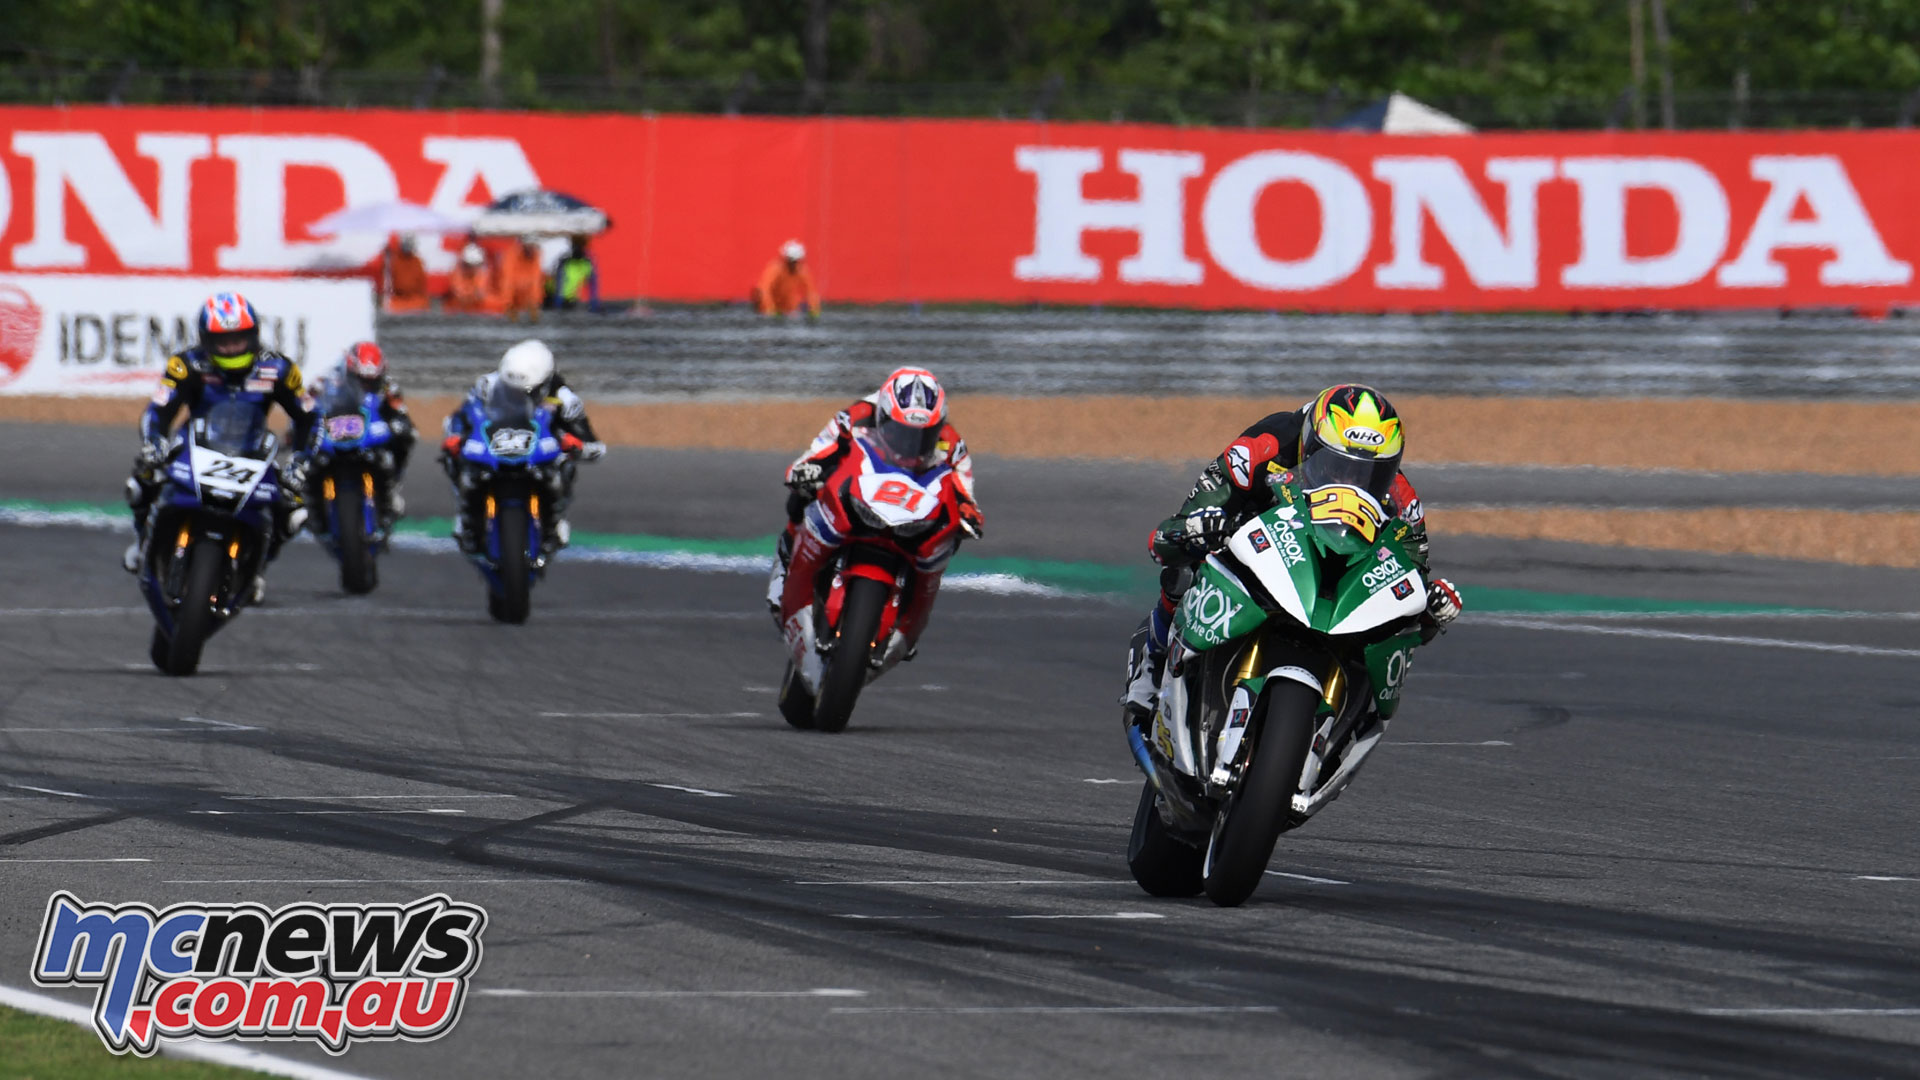 ARRC Rnd Chang Thai Azlan Shah Race Group